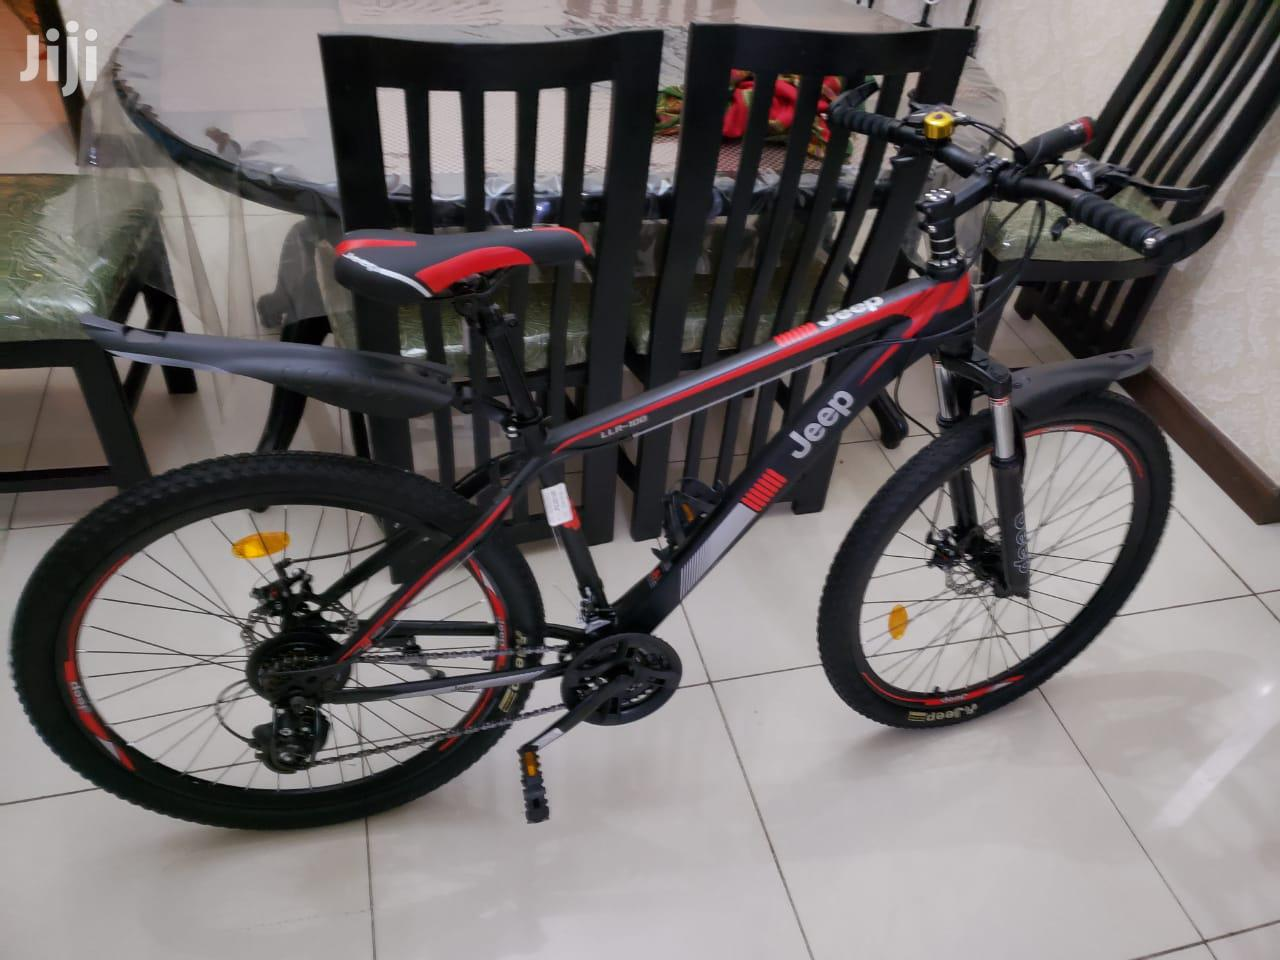 Jeep Original Bicycle for Sale, Best Price Mountain Bike   Sports Equipment for sale in Westlands, Nairobi, Kenya